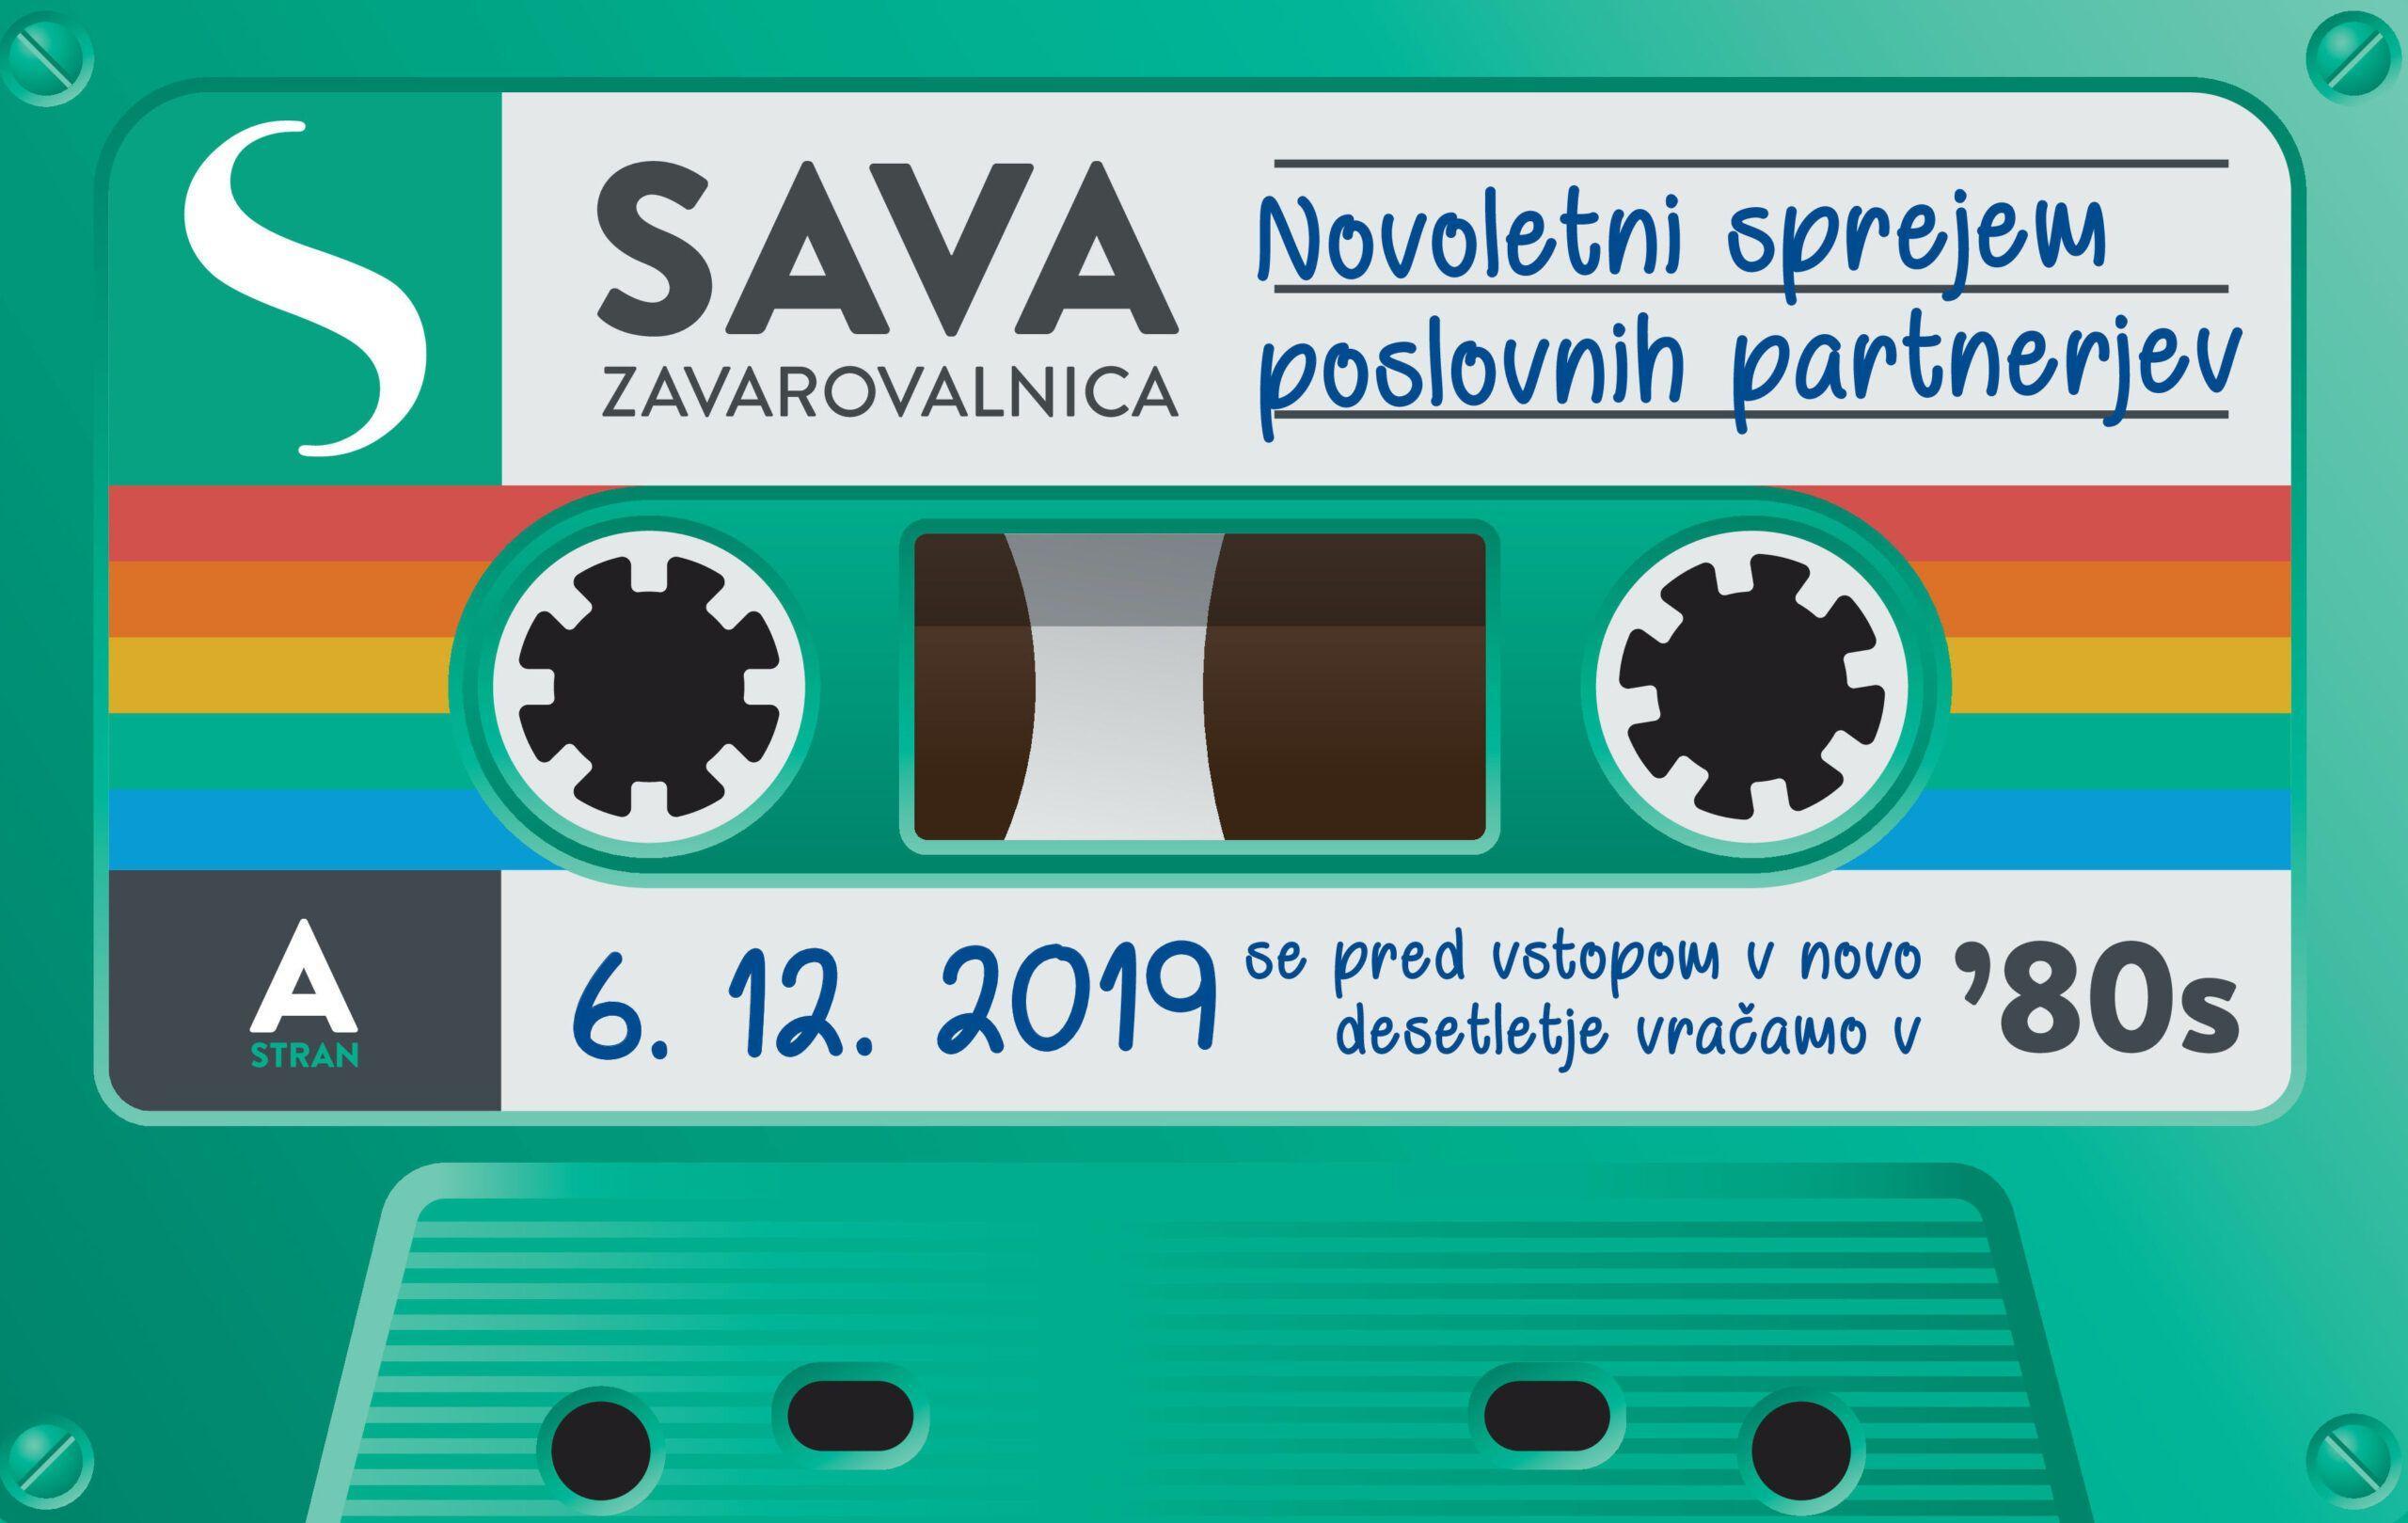 KASETA_SAVA_NOVOLETNI SPREJEM_KASETA_03